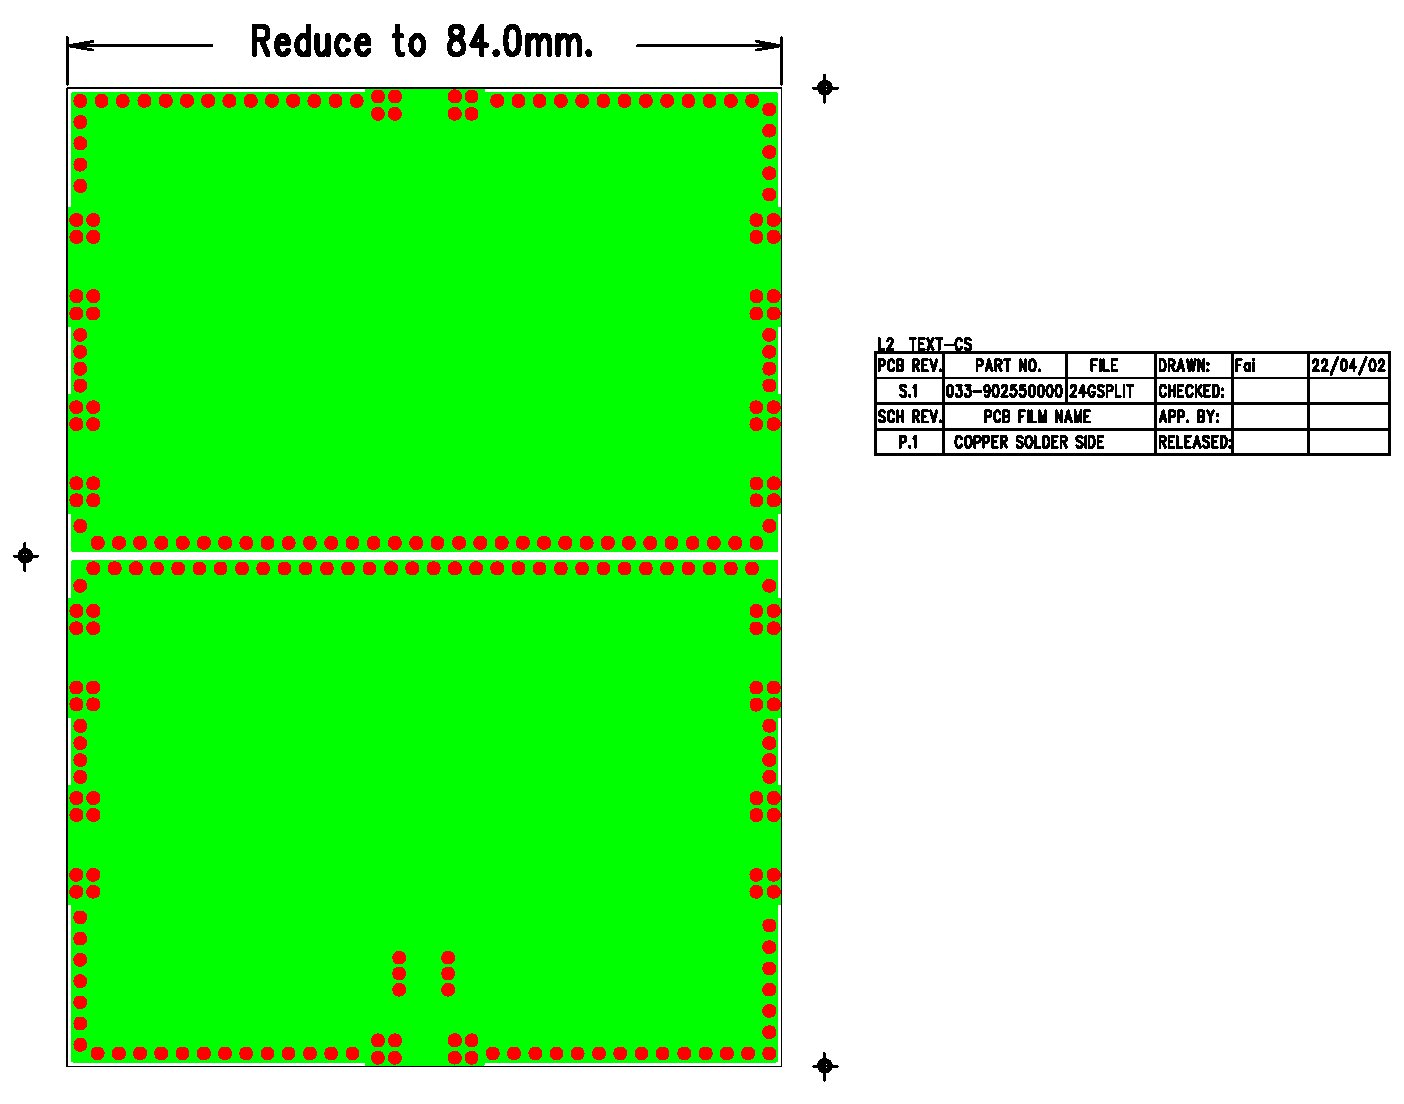 4 Ports Power Splitter 24 Ghz Rf Circuits 30watt Vhf Amplifier Circuit For Fm Broadcast Band Source